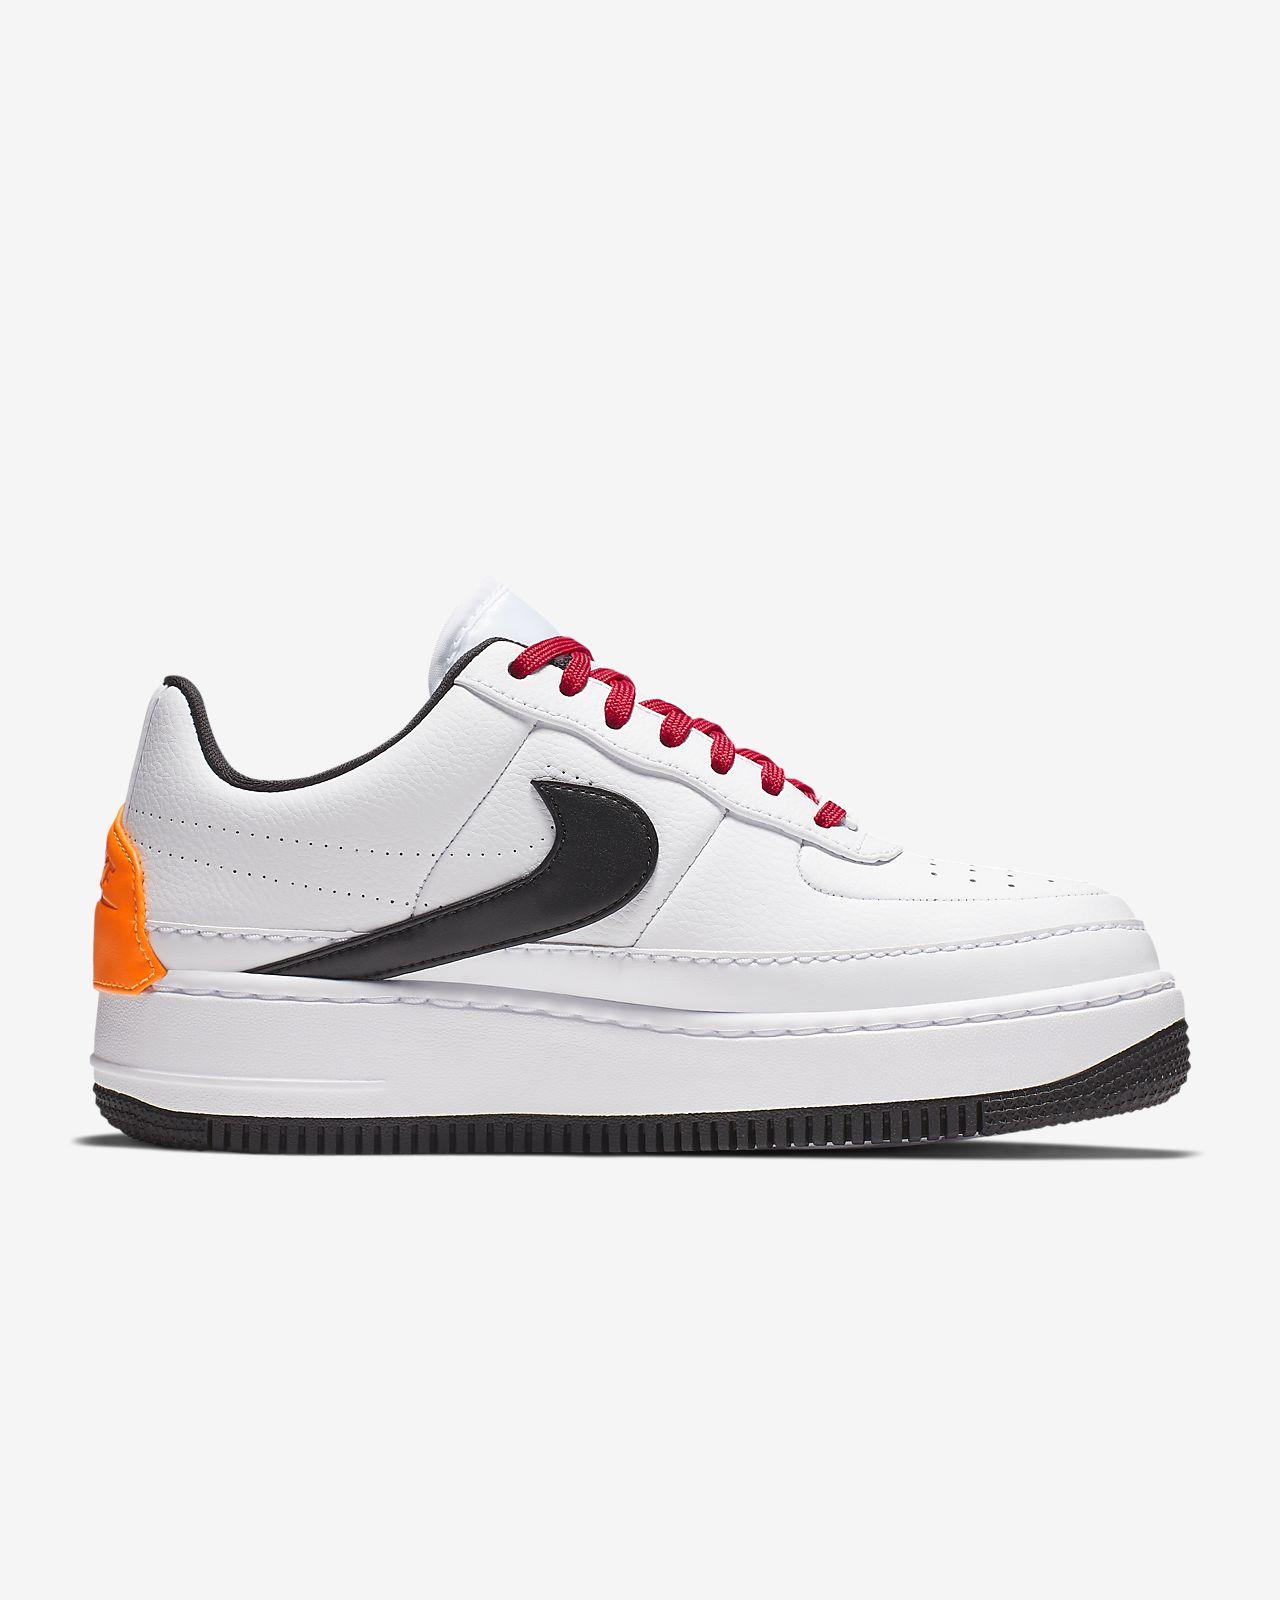 Nike Pour Chaussure Se FemmeMa Af1 Jester Xx v0O8nmNw